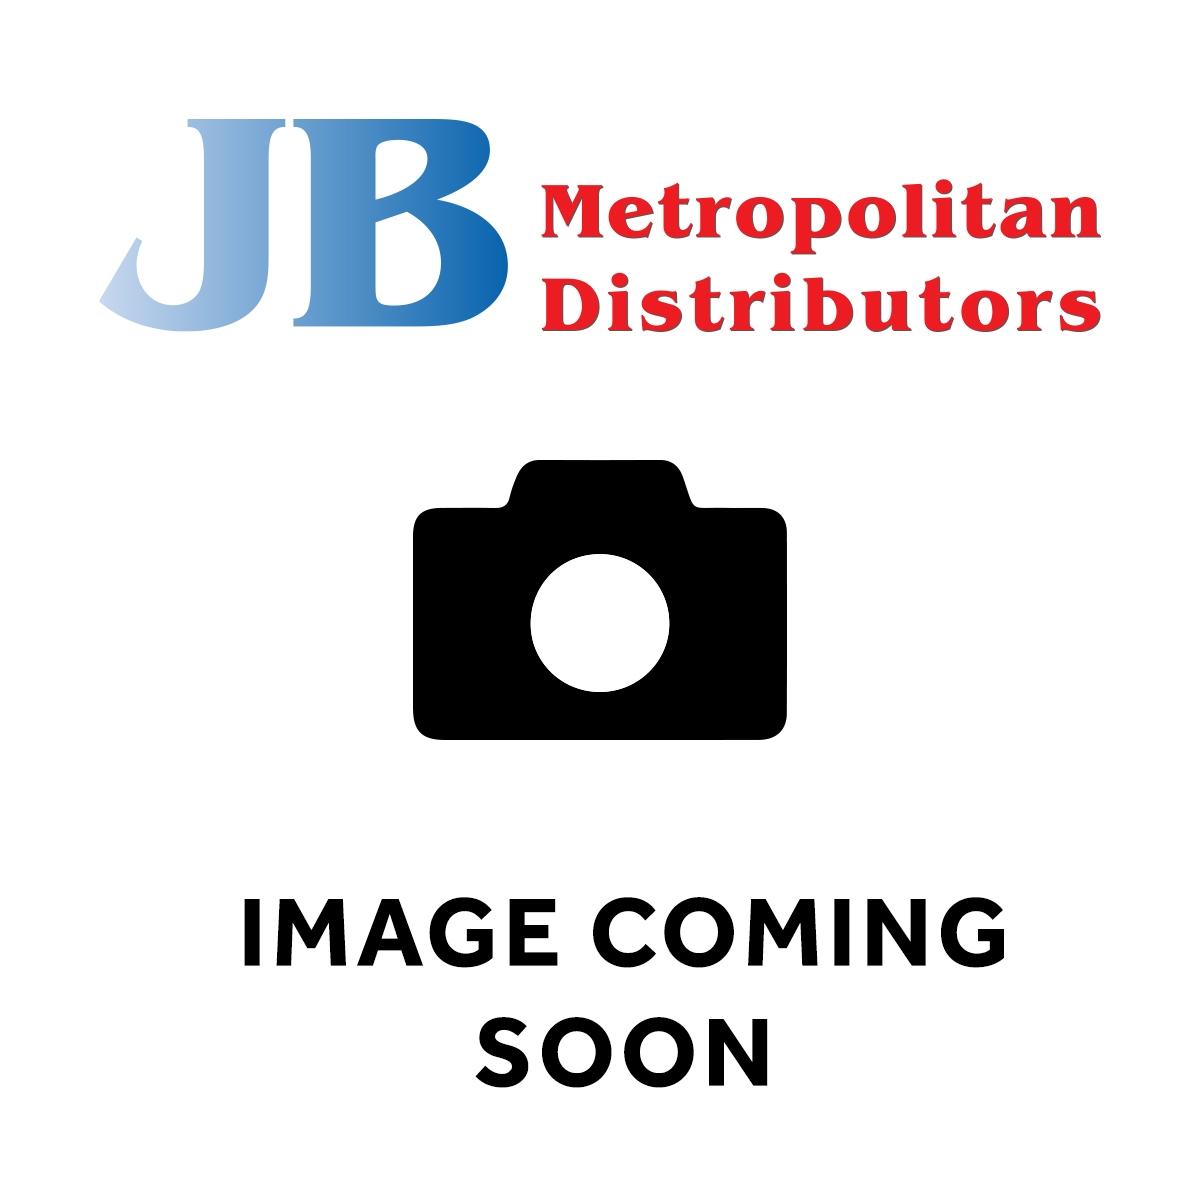 175G SAMBOY ATOMIC TOMATO